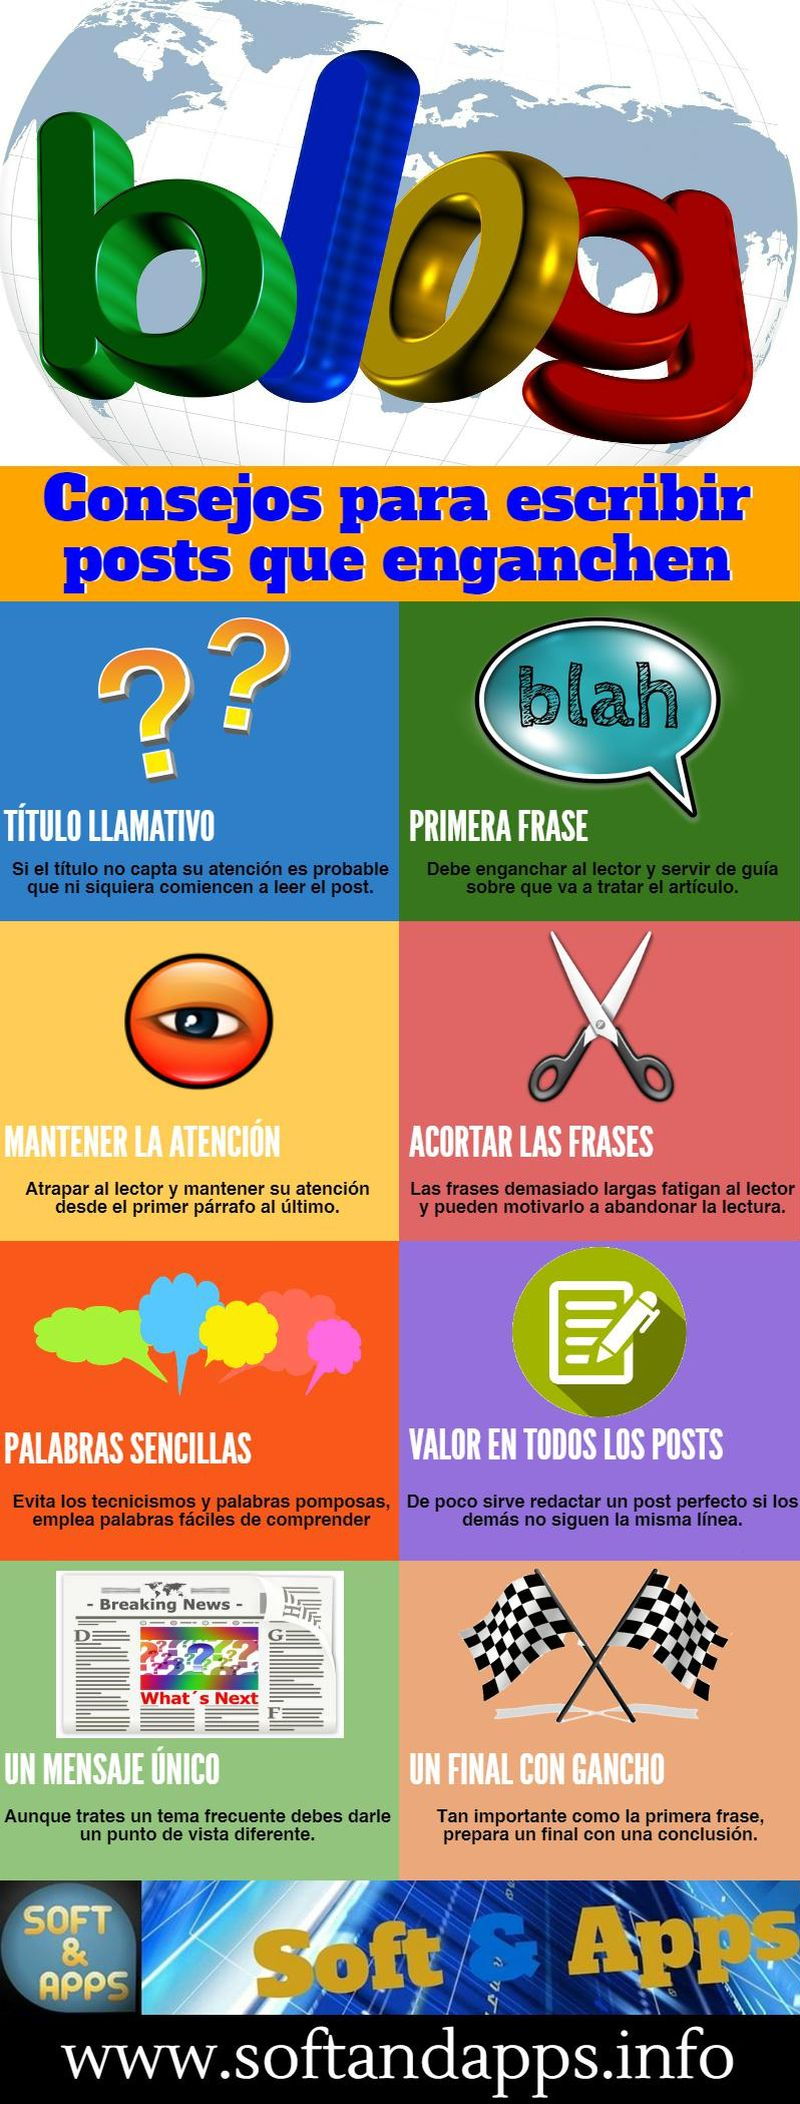 Consejos para escribir posts - Infografía